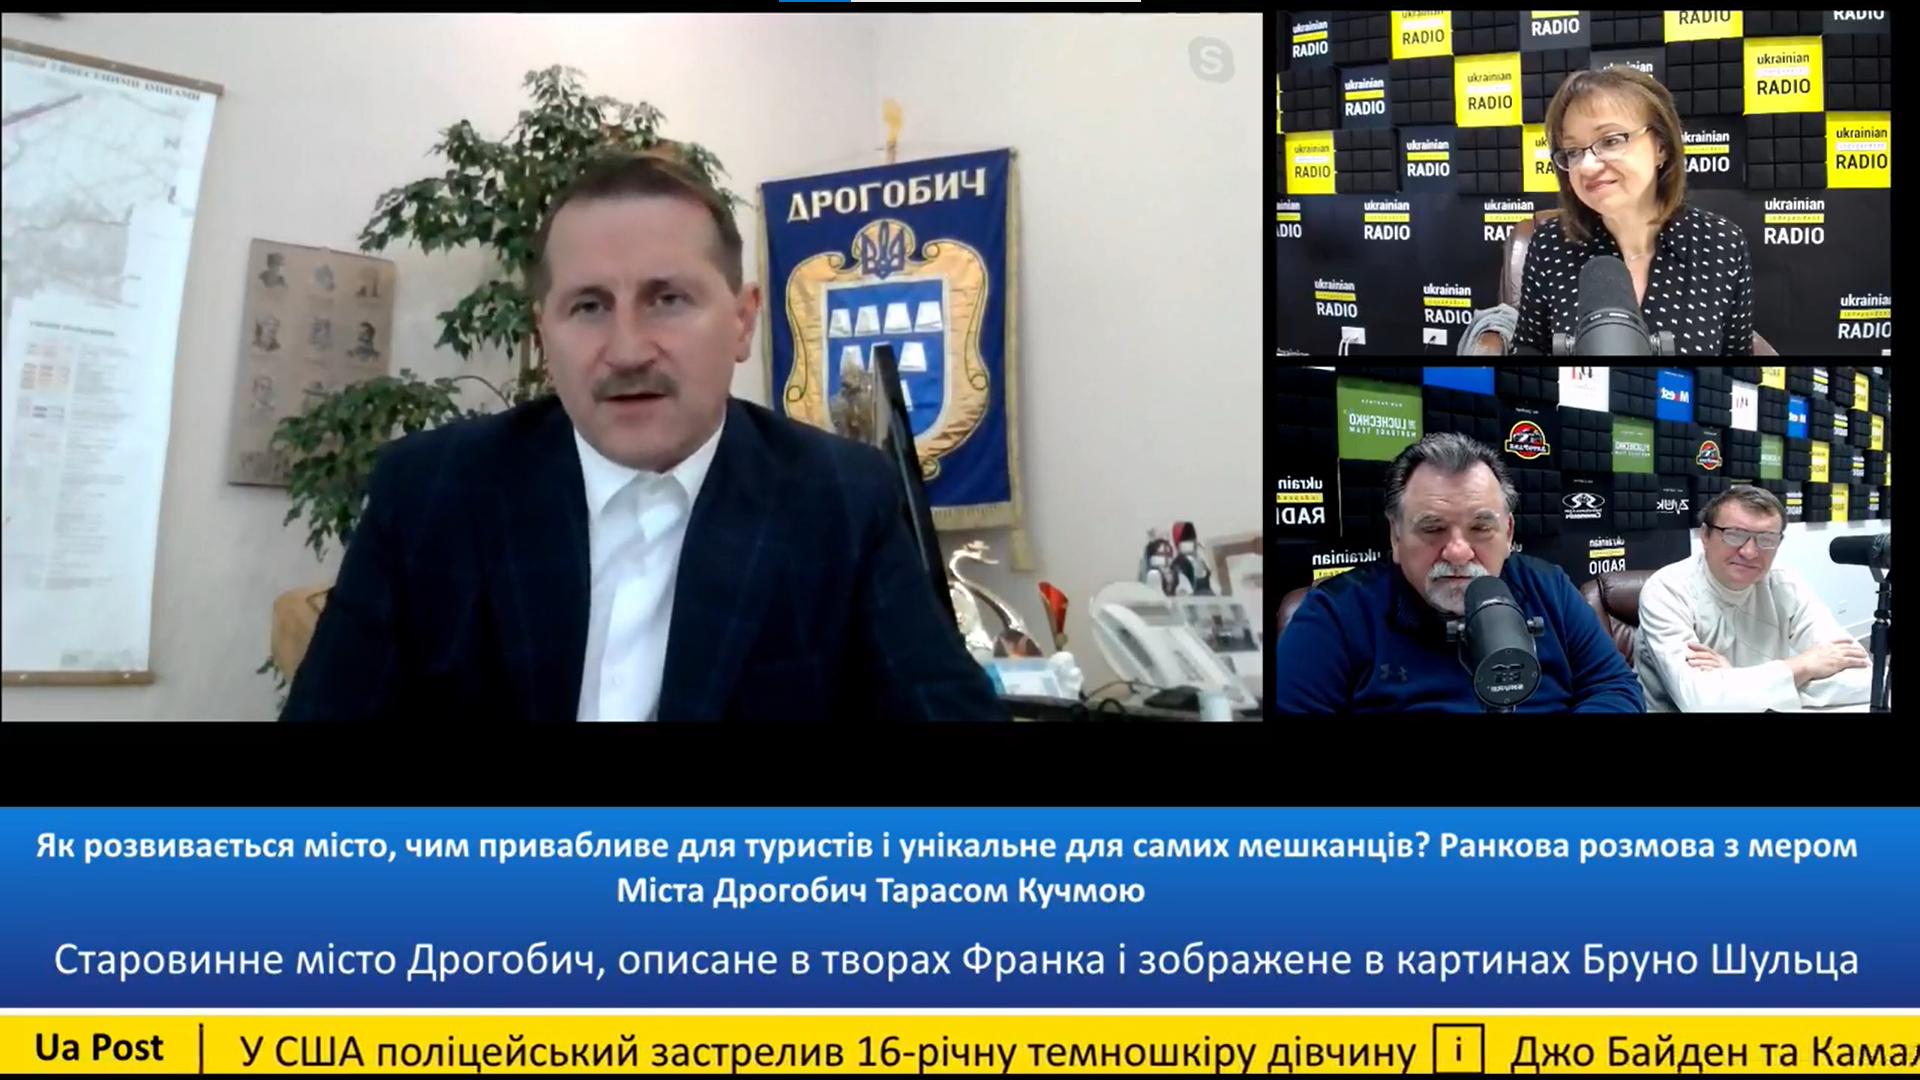 Інтерв'ю Тараса Кучми для студії Ukrainian Independent Radio